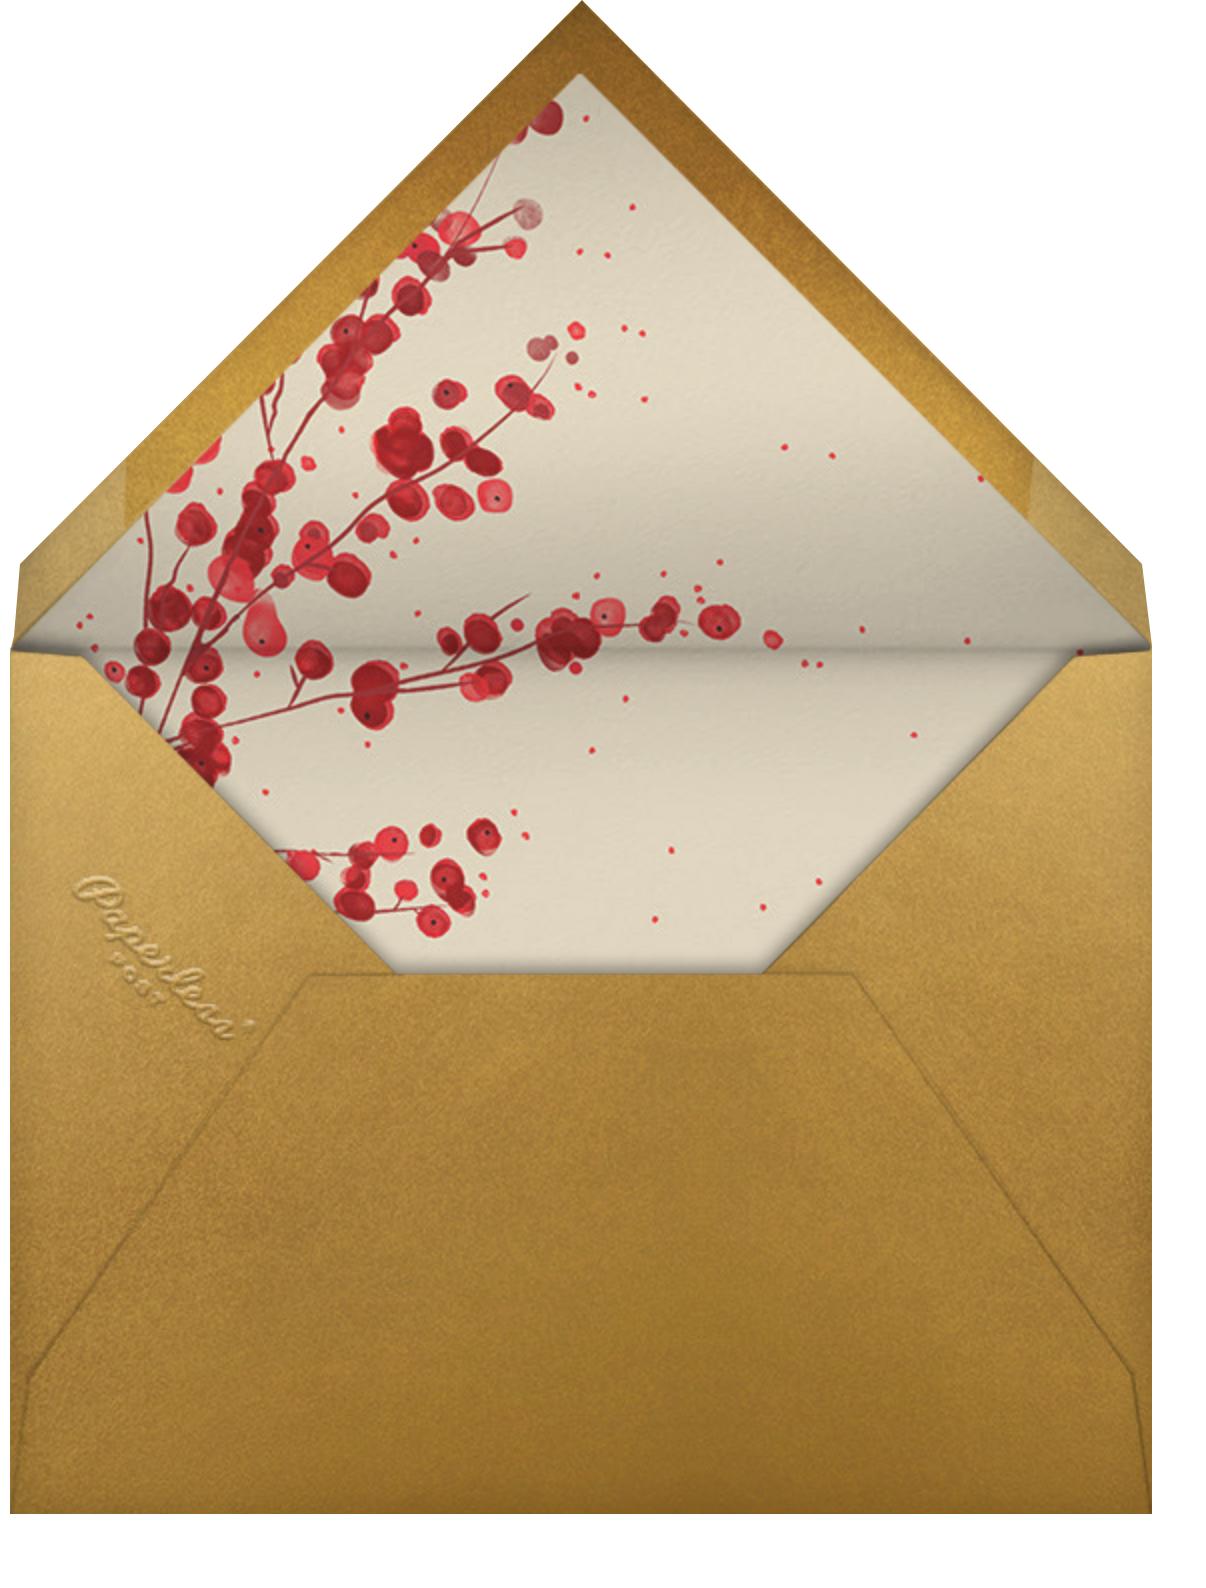 In Season - Paperless Post - Christmas party - envelope back